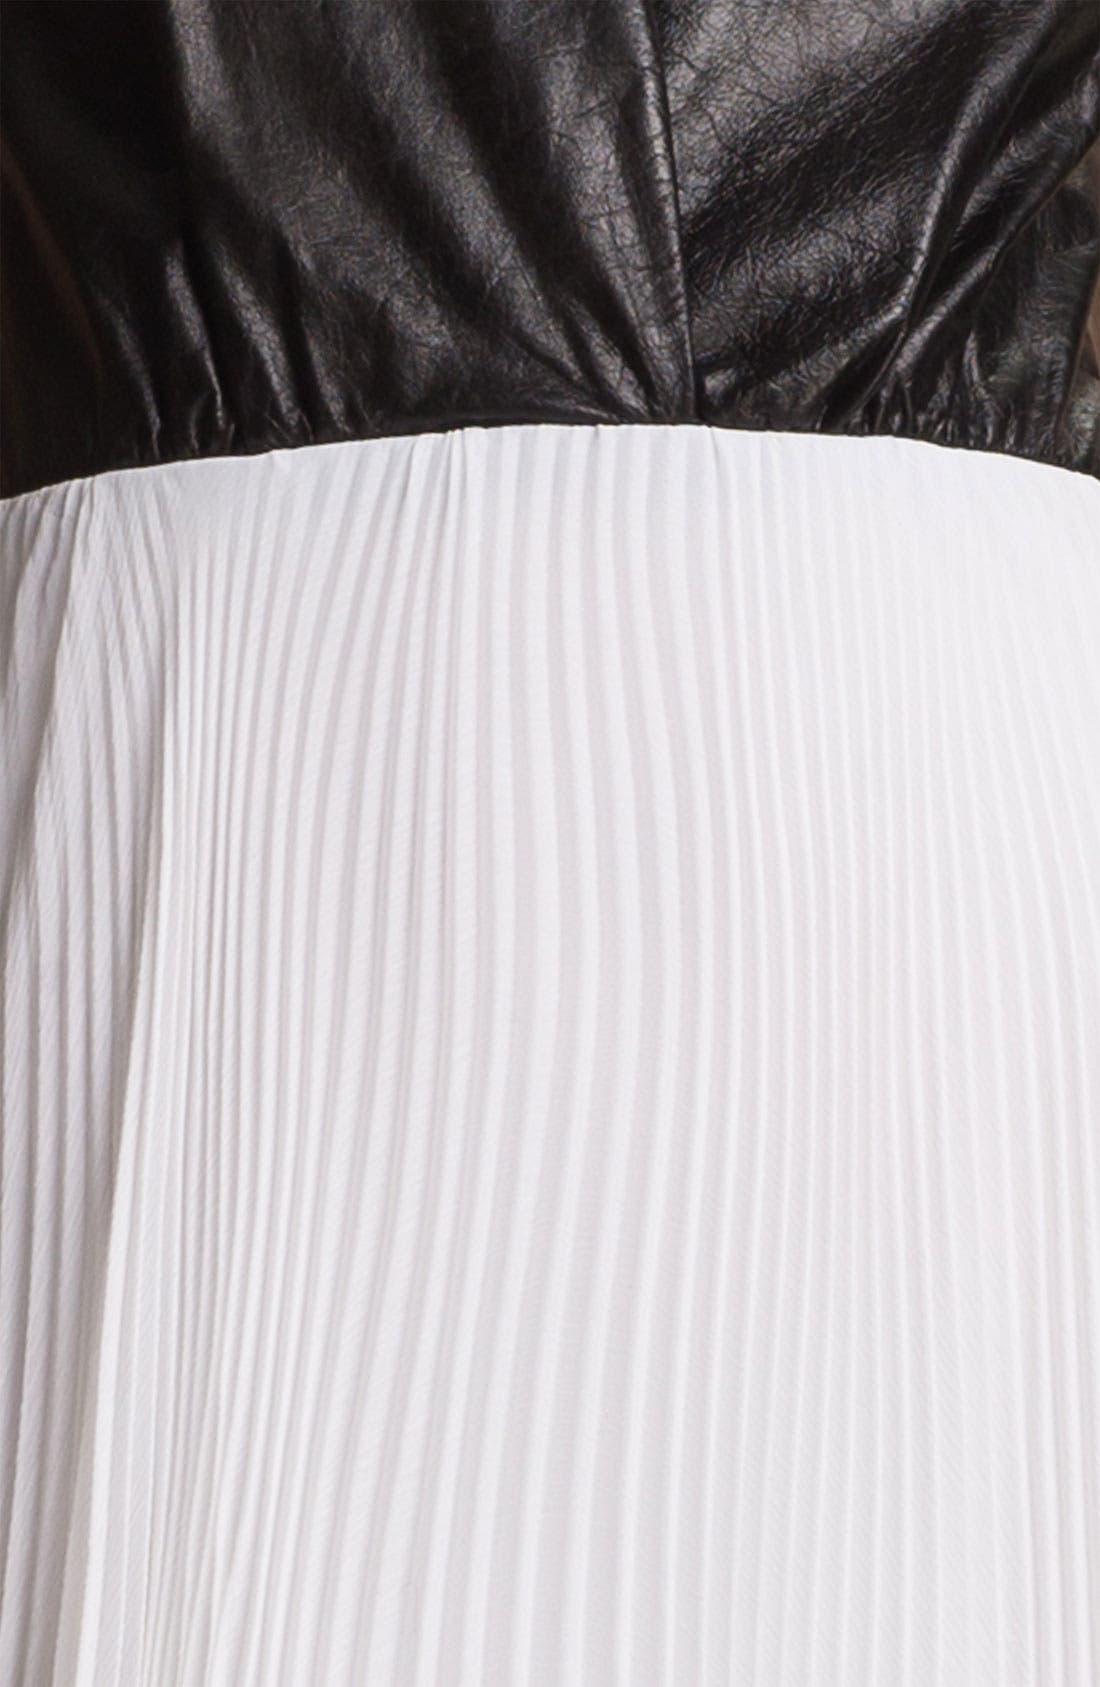 ALICE + OLIVIA,                             Leather Bodice & Chiffon Dress,                             Alternate thumbnail 2, color,                             009